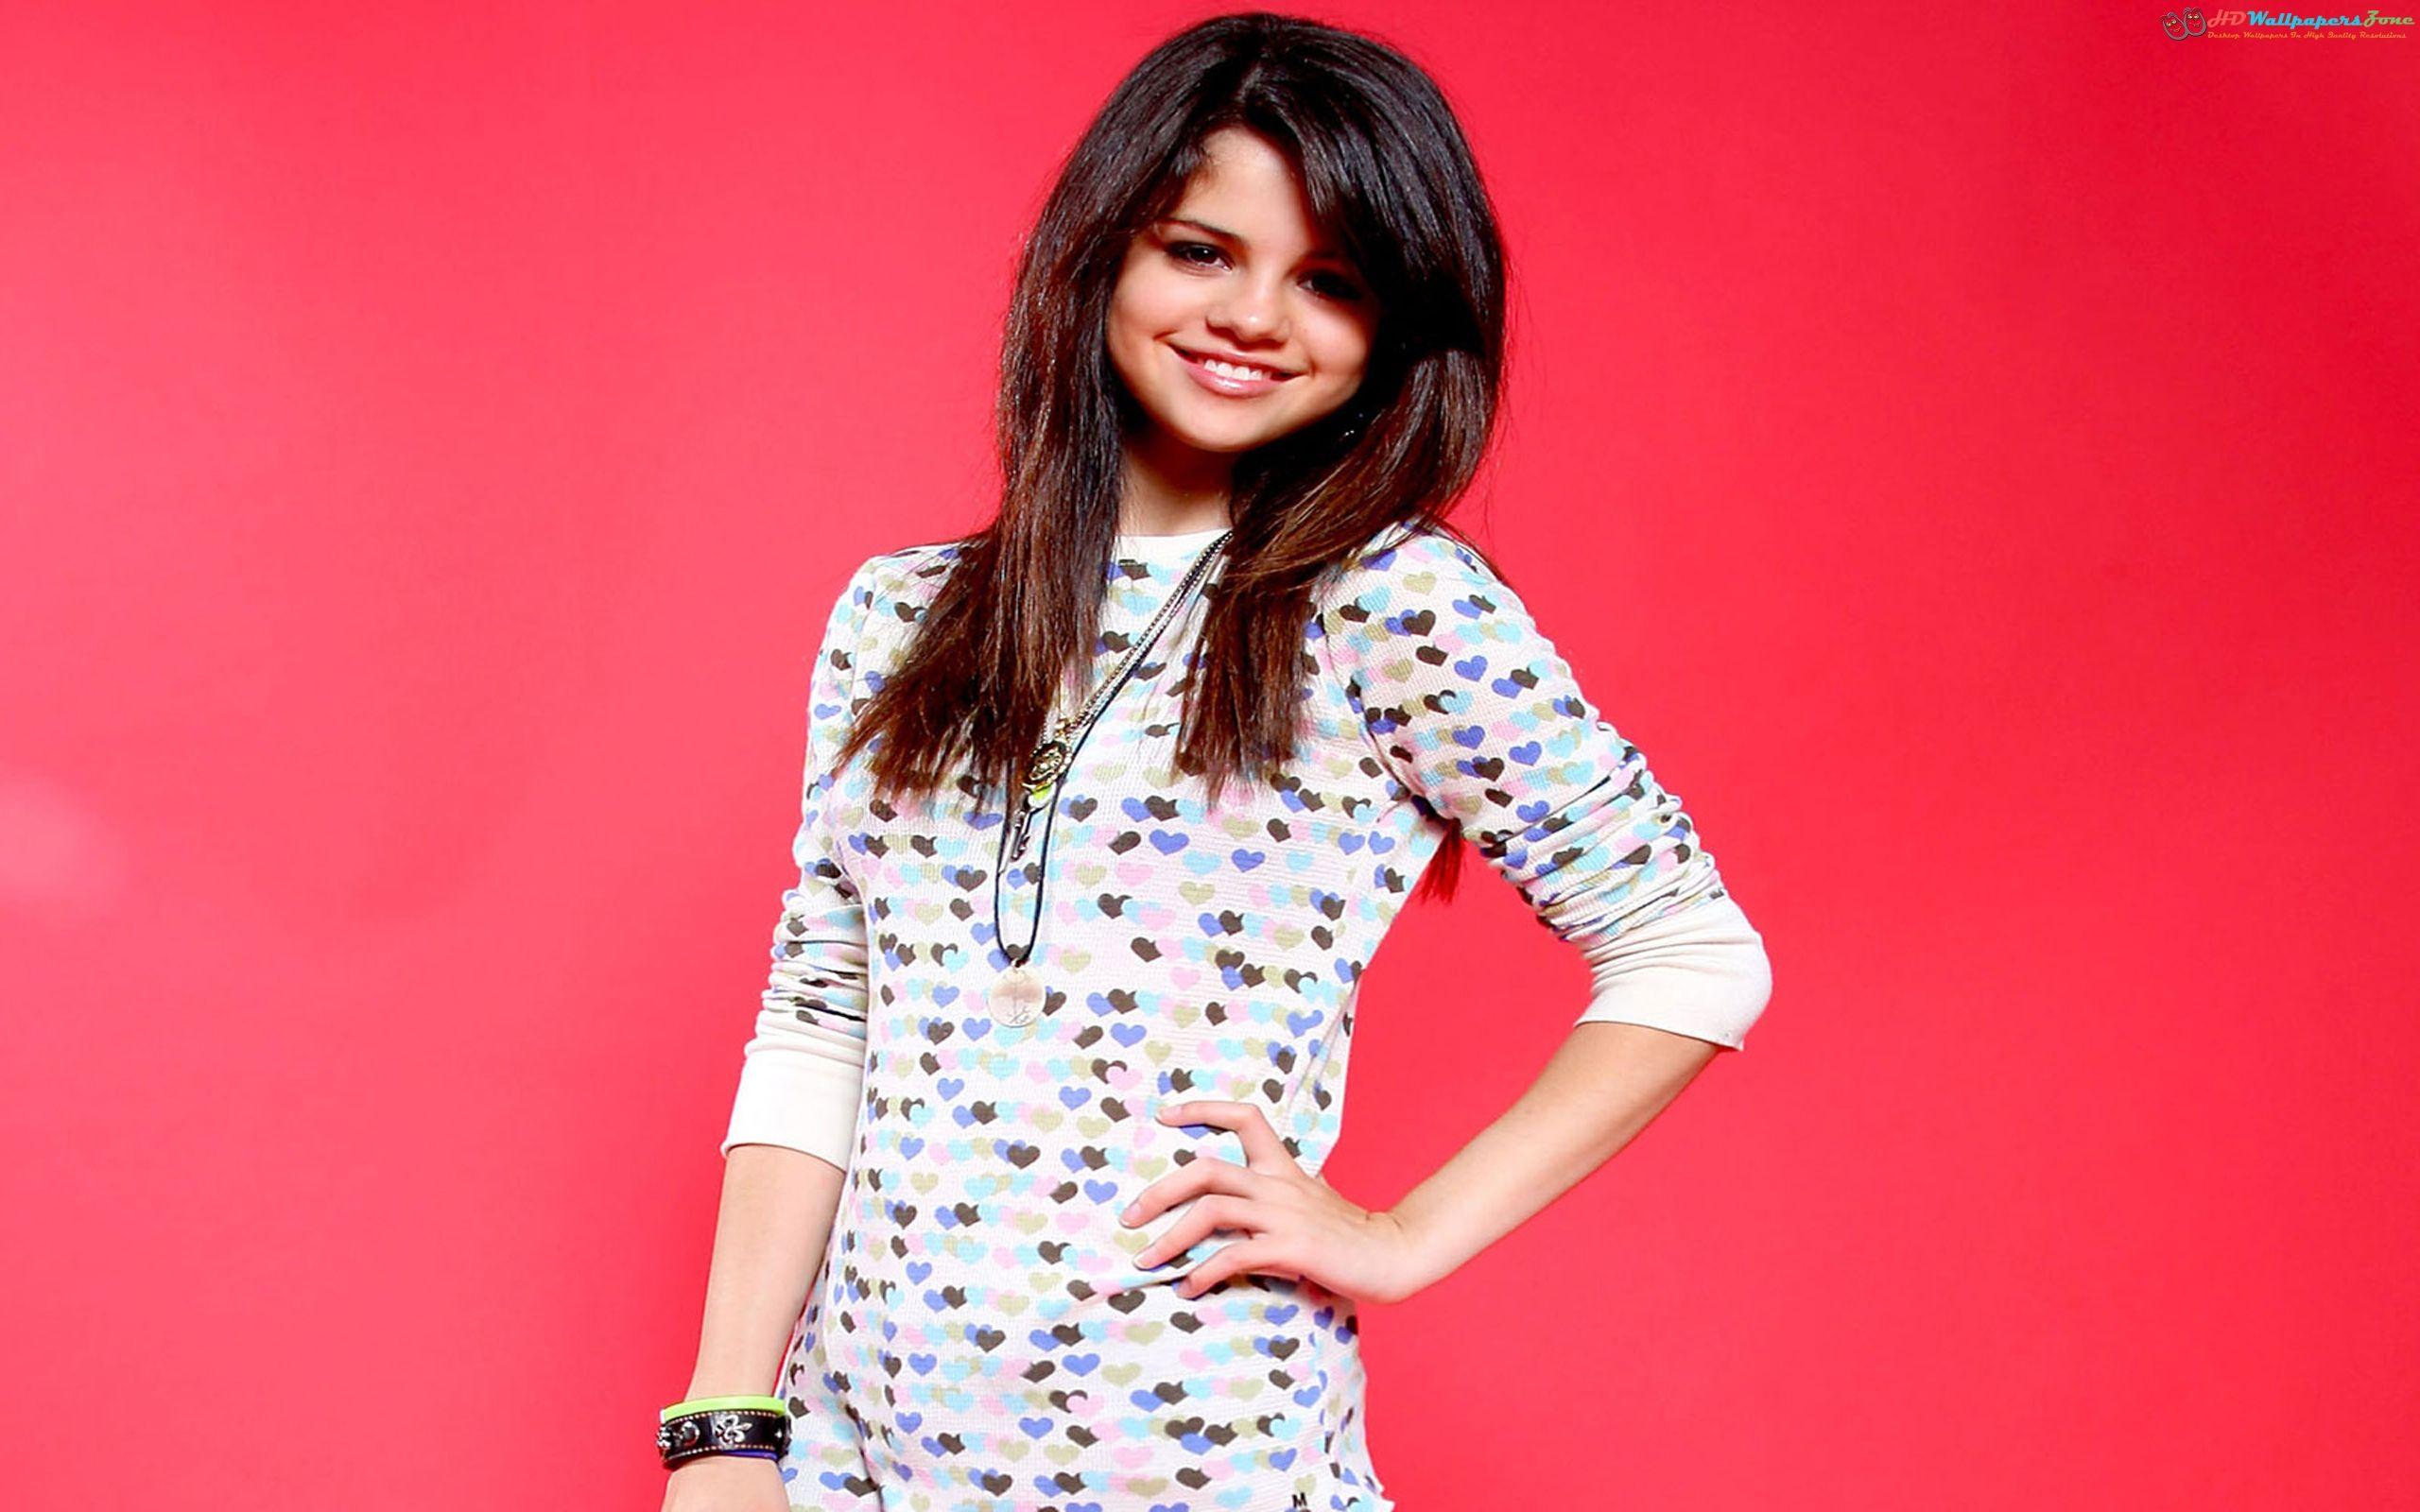 Selena Gomez Cute HD Wallpaper #1 only at http://www.hdwallpaperszone